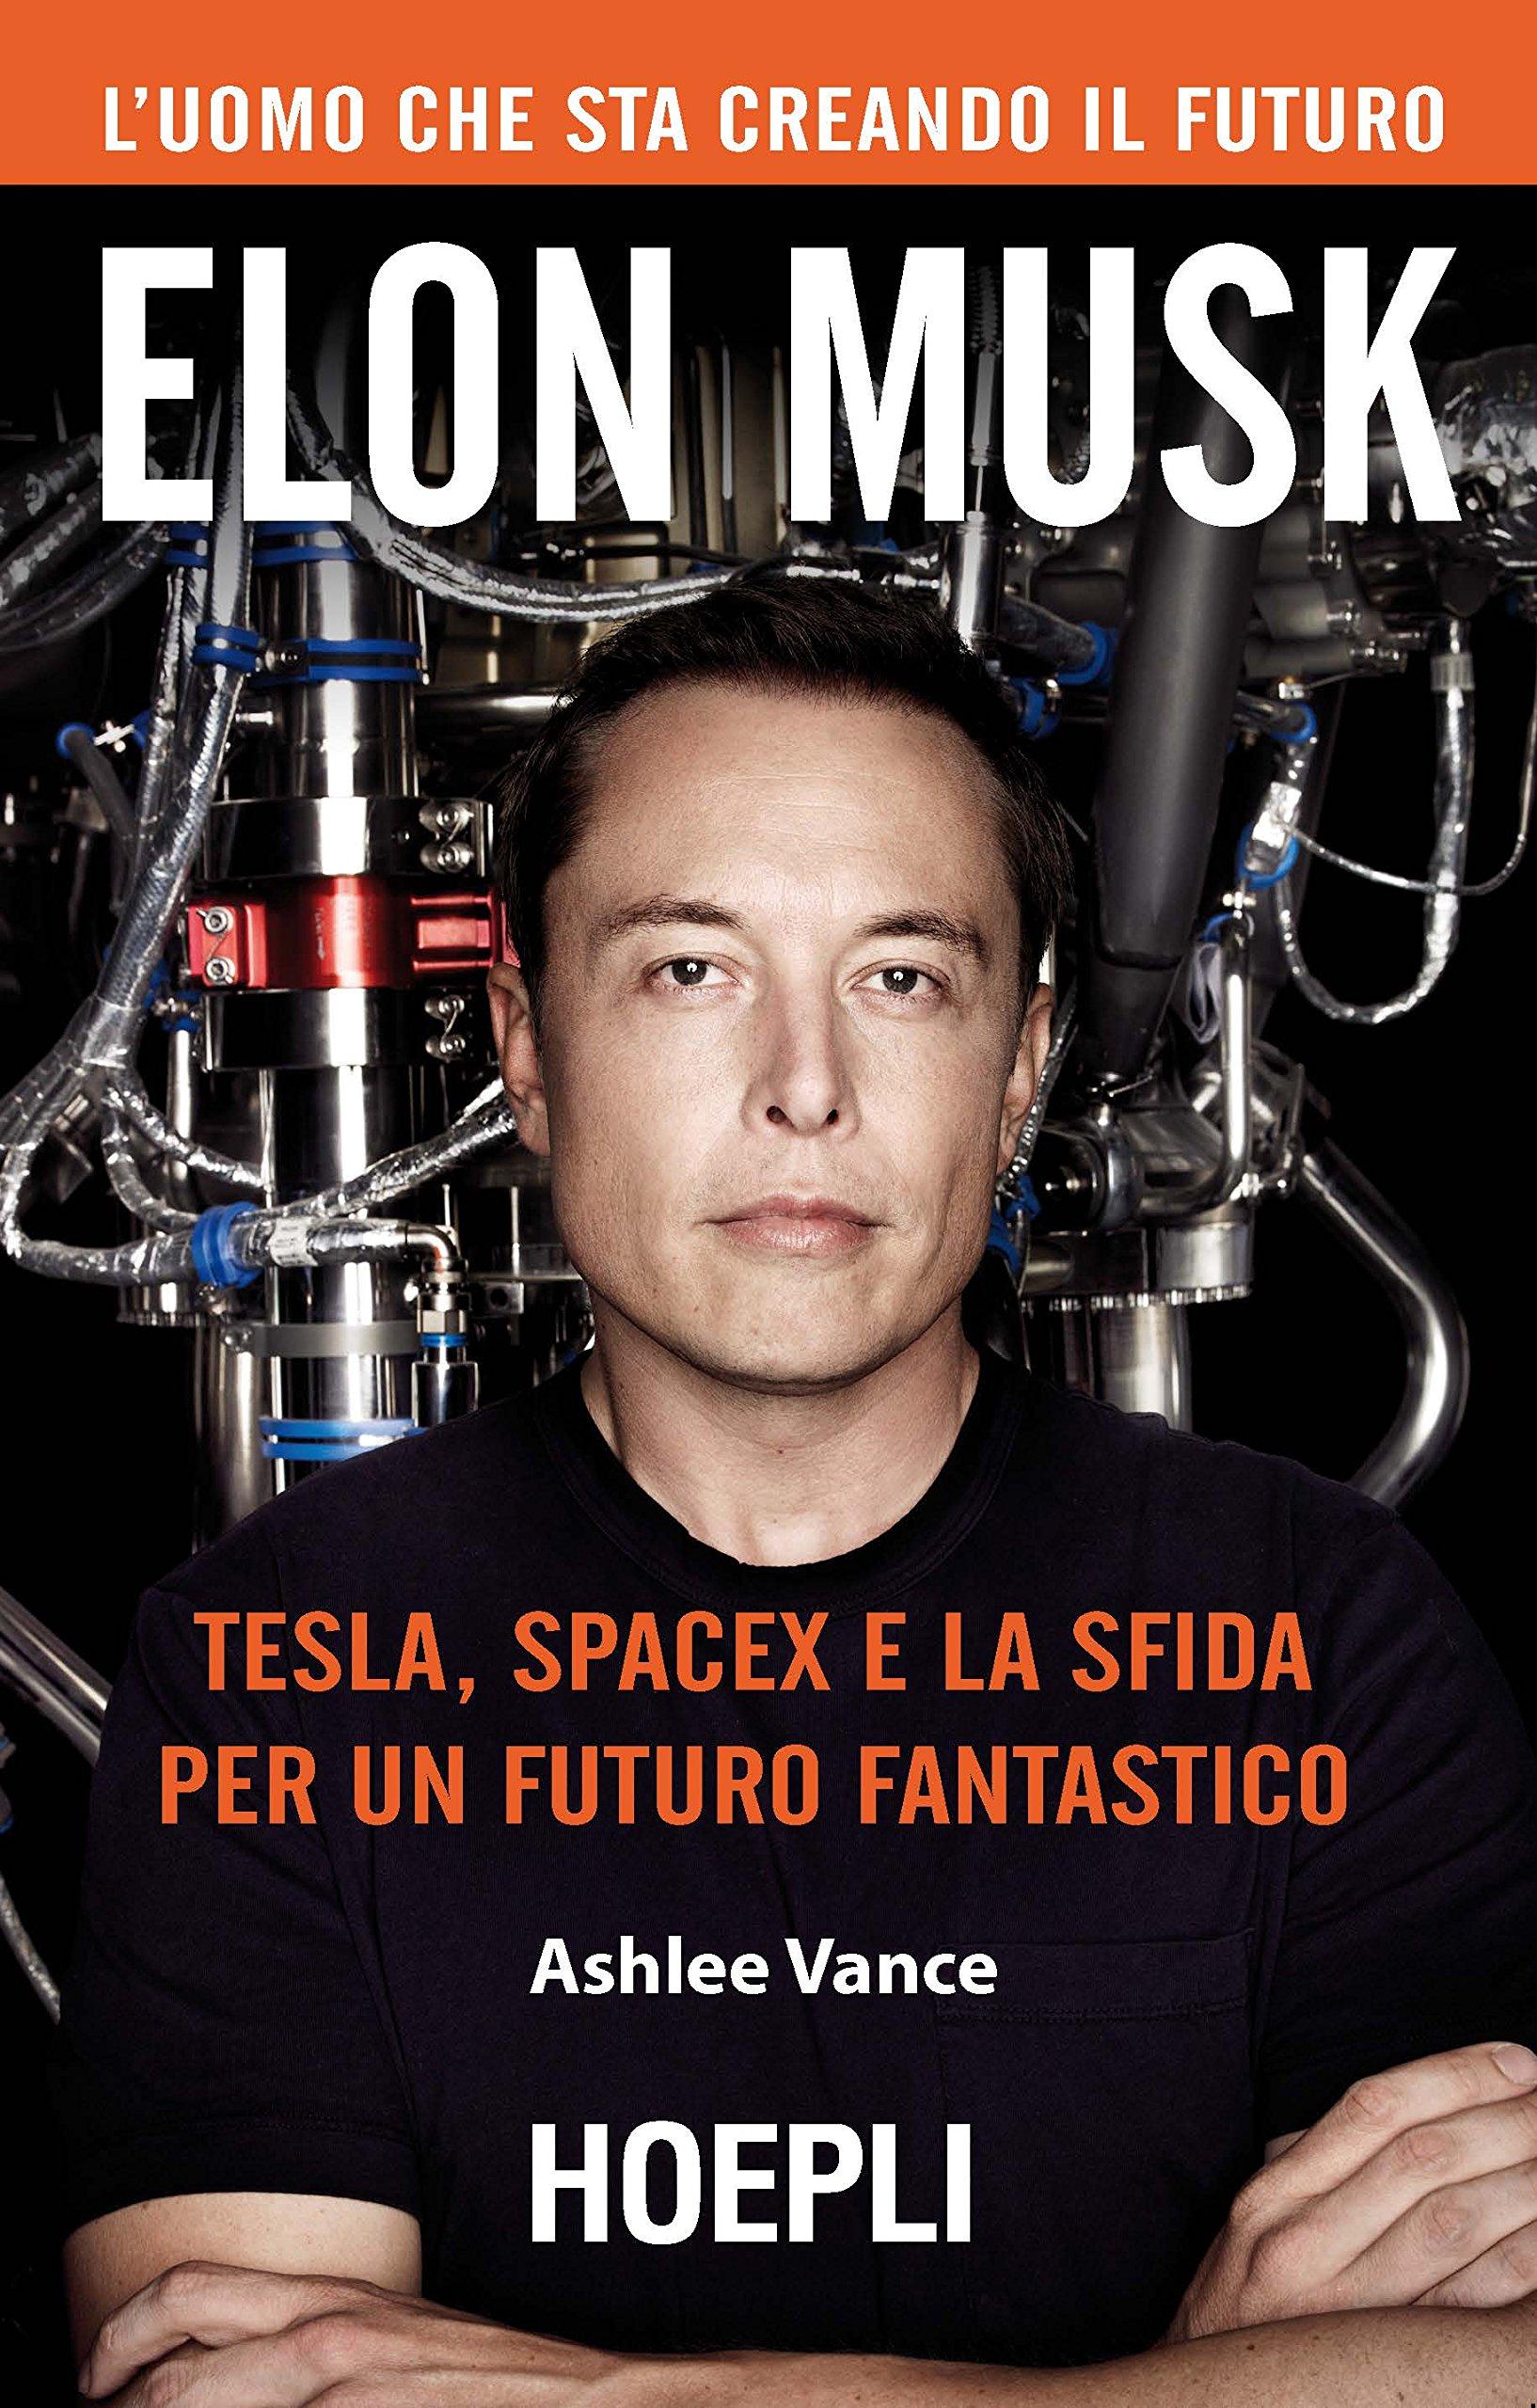 Copertina Libro Elon Musk